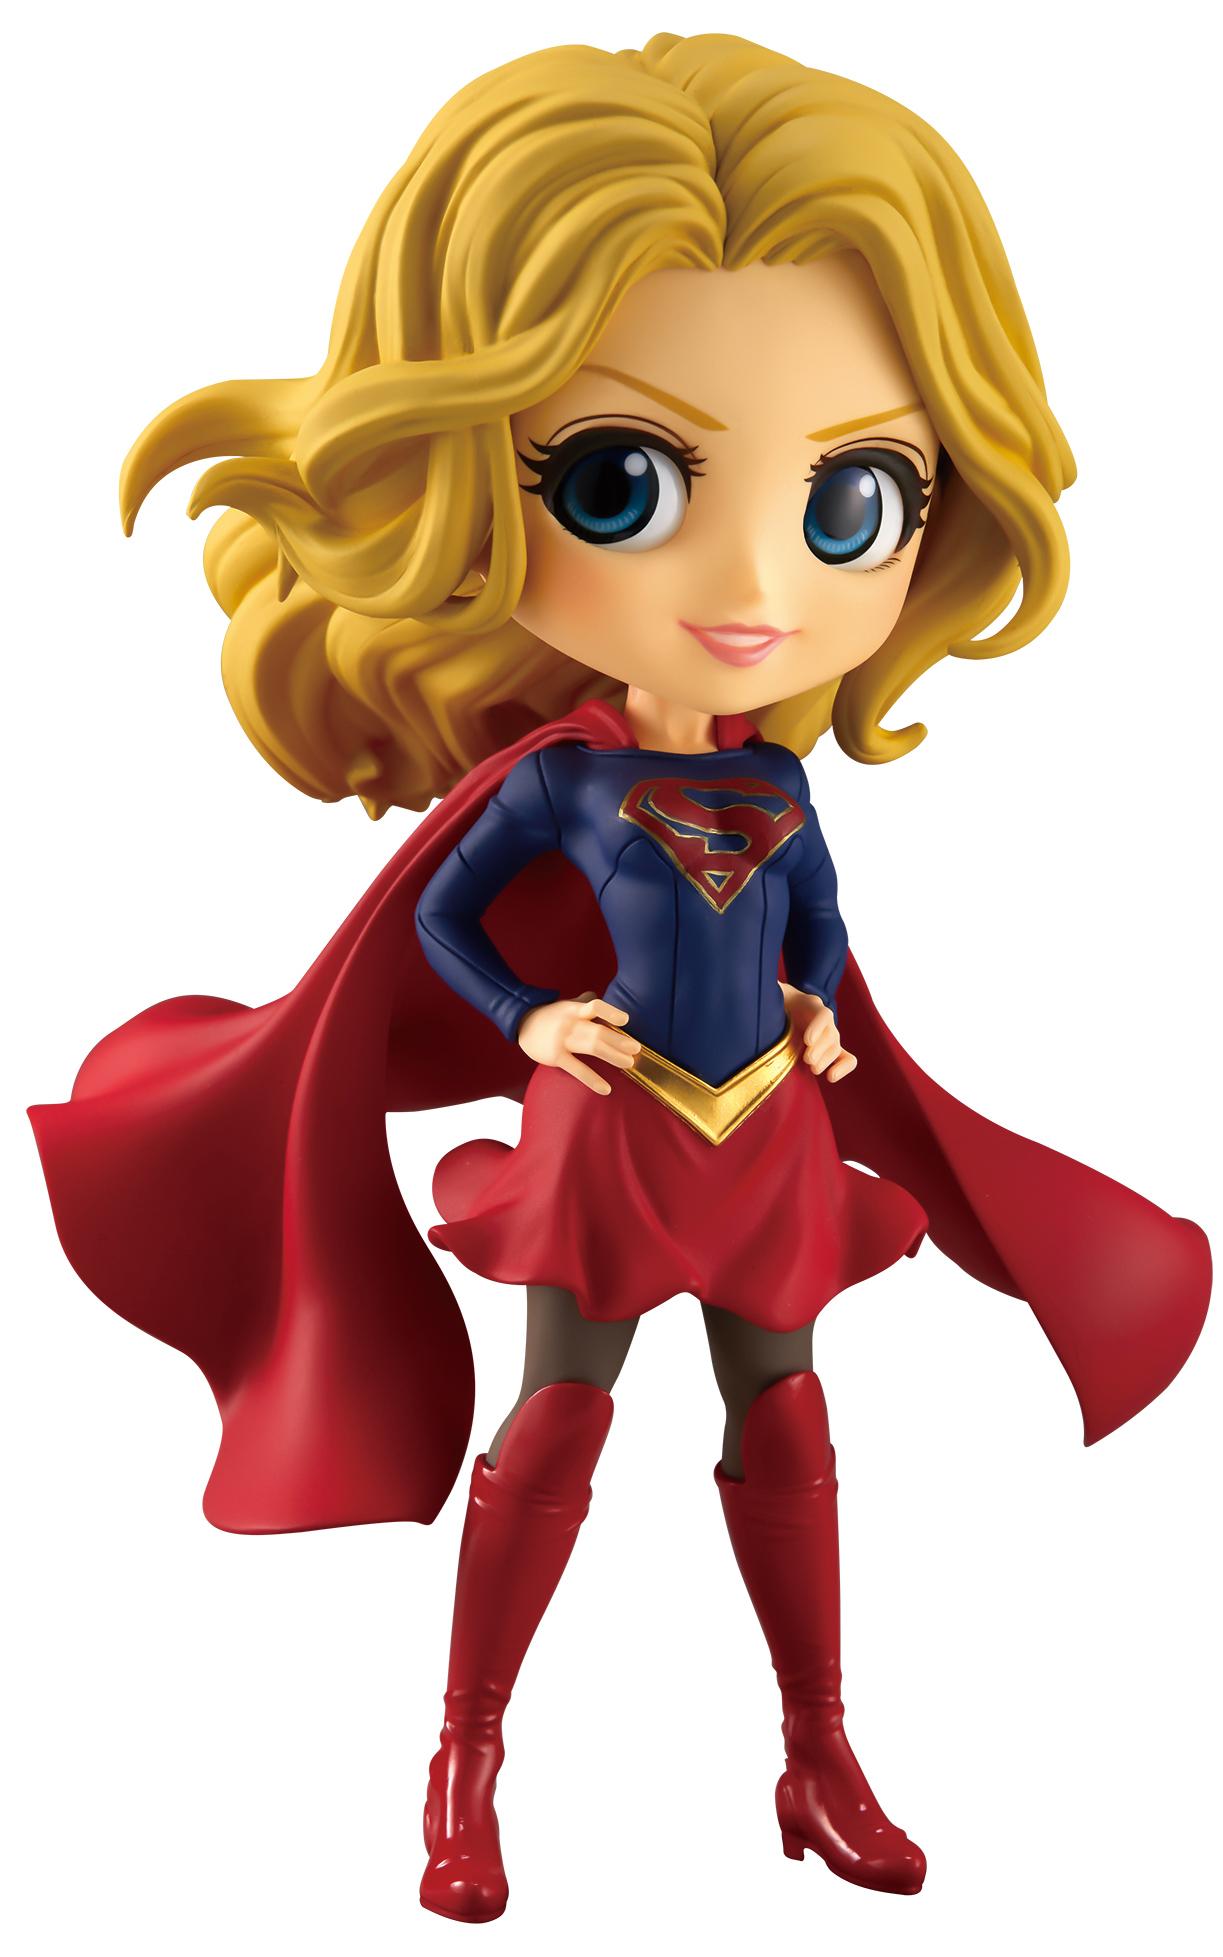 Фигурка Q Posket DC Comics: Supergirl A Normal Color фигурка banpresto dc comics catwoman 82748